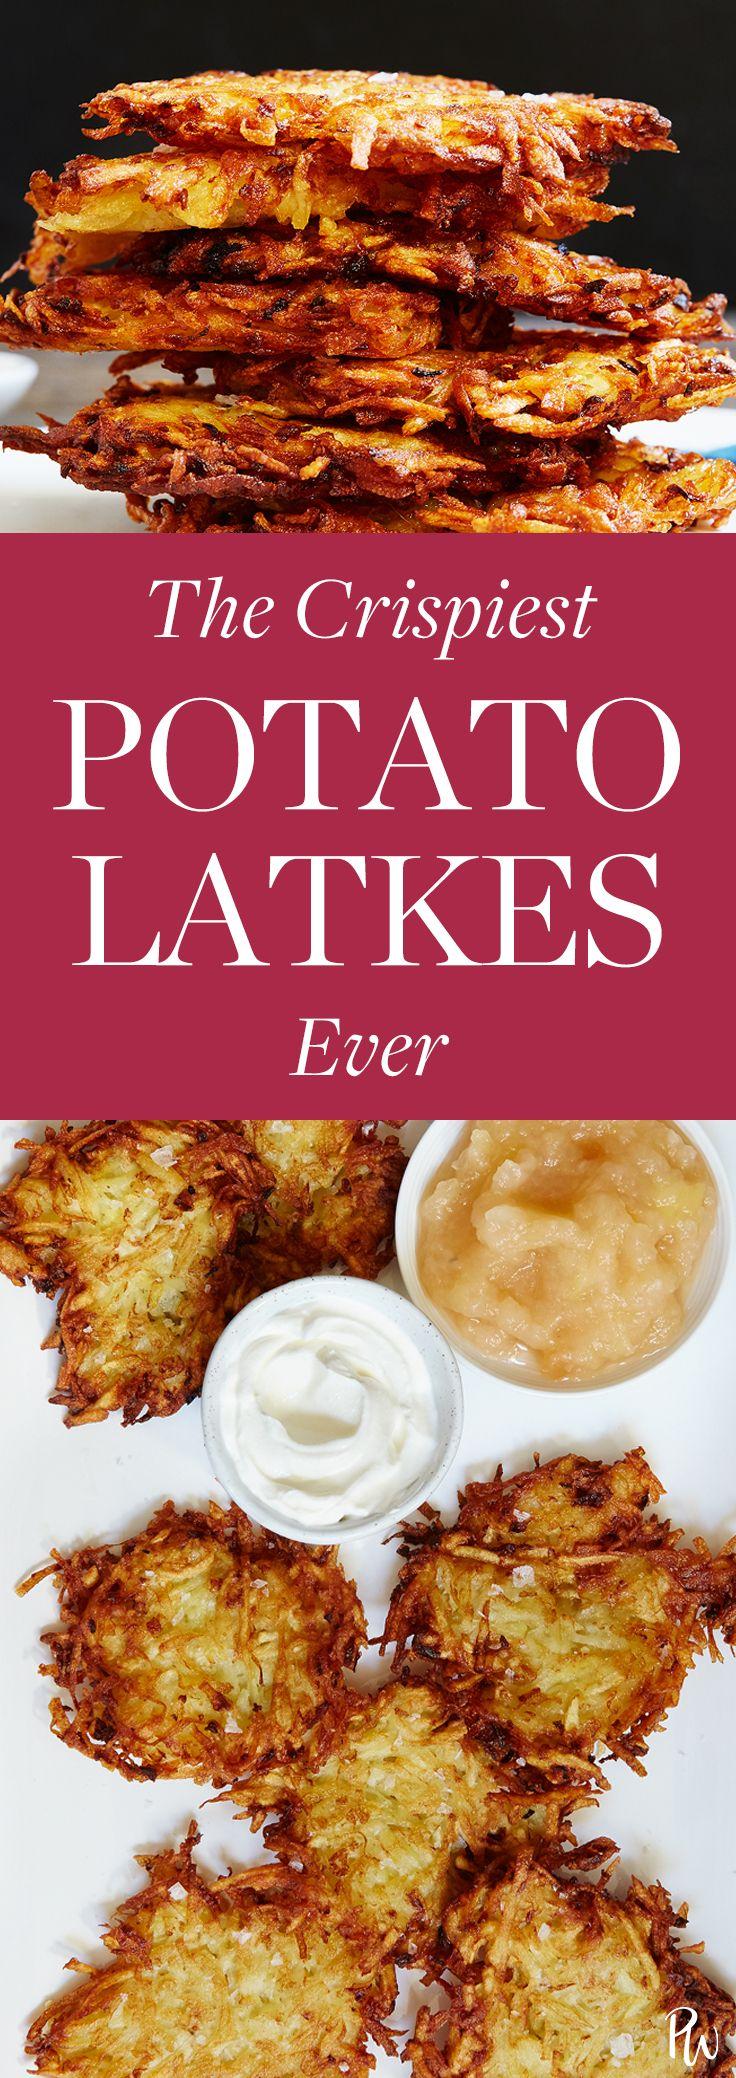 Crispy potato latkes. Get the recipe. #latkes #potatolatkes #hanukkah